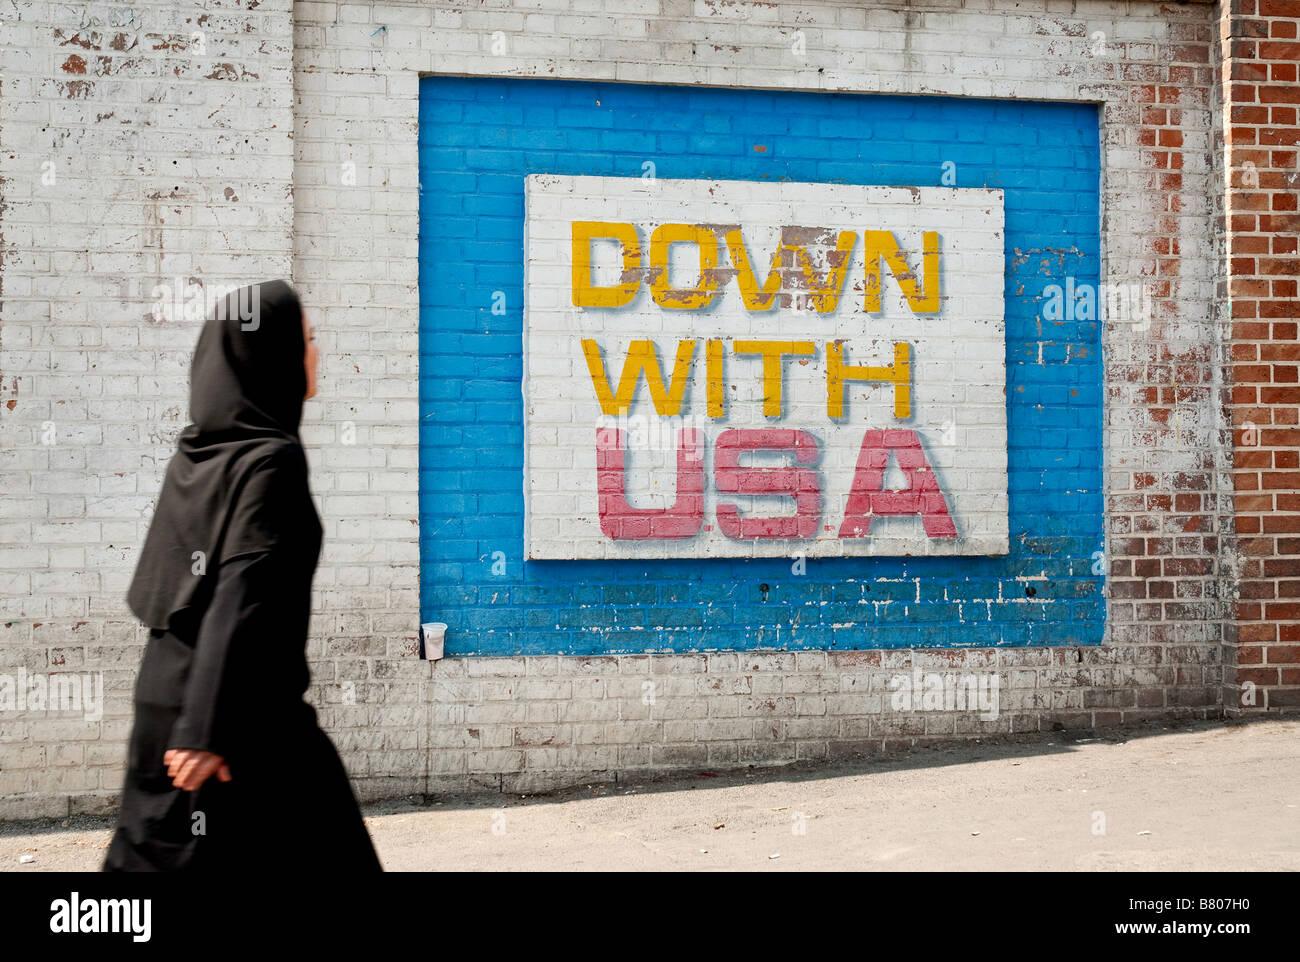 tehran black cloak wearing muslim woman walking past anti american mural outside old american embassy in teheran - Stock Image